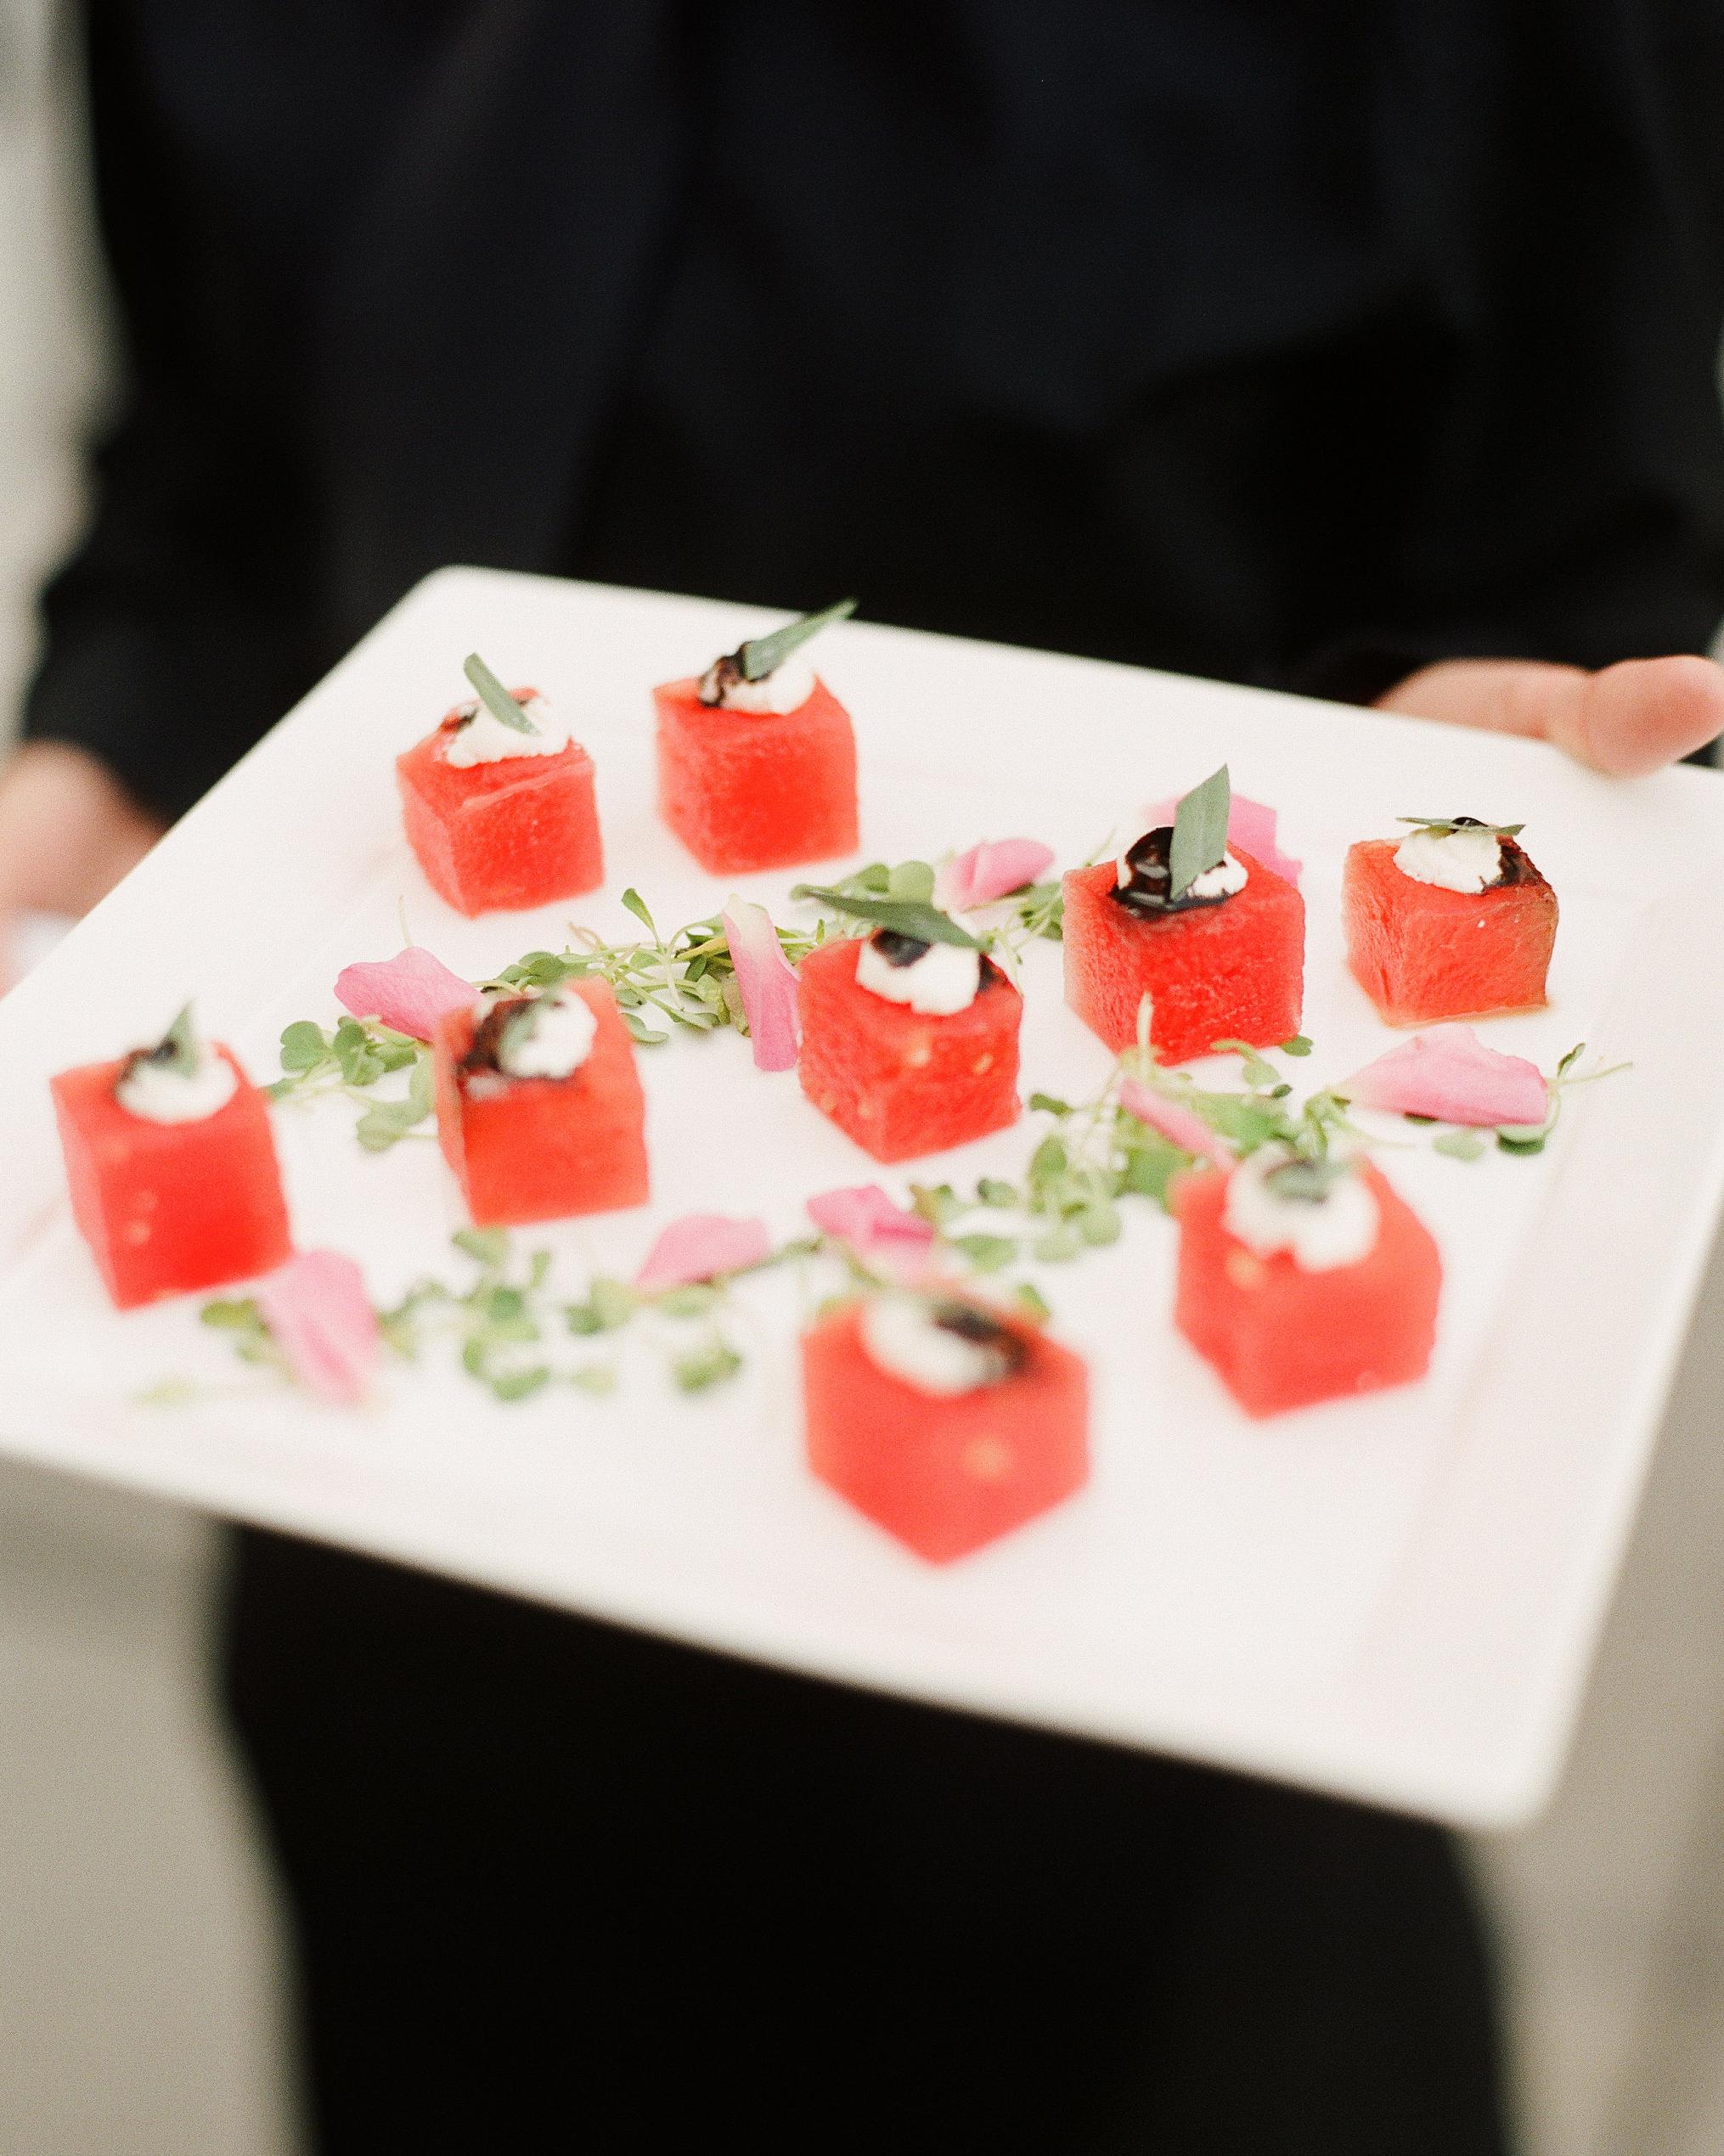 christina-jimmy-wedding-appetizers-8046.jpg